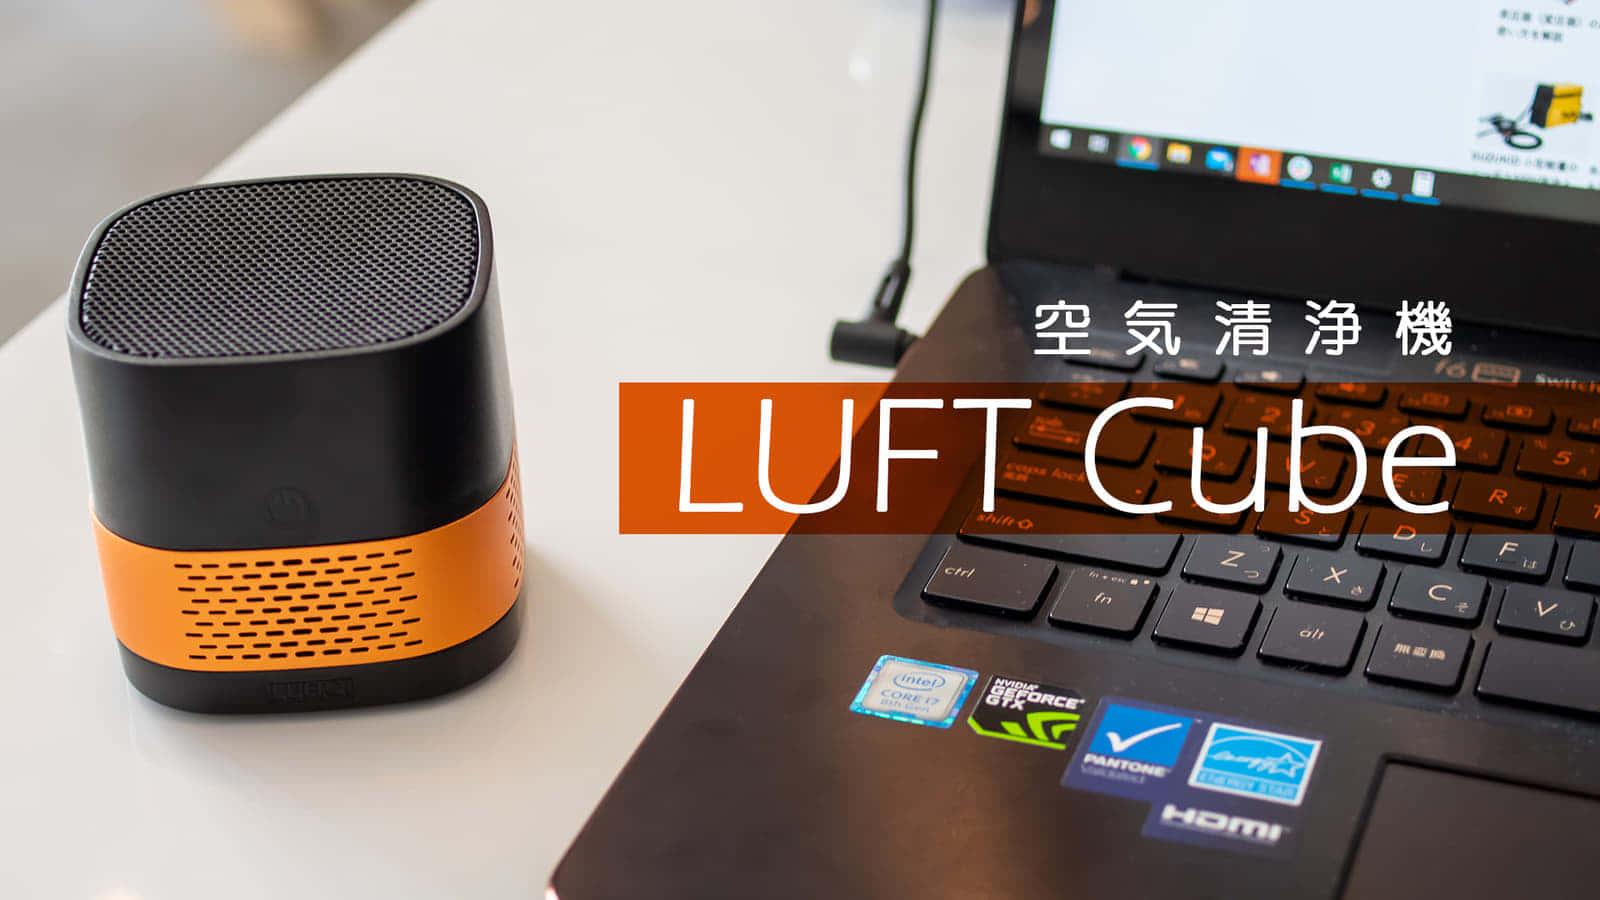 「LUFT Cube」コンパクトなポータブル空気清浄機|Makuake先行レビュー